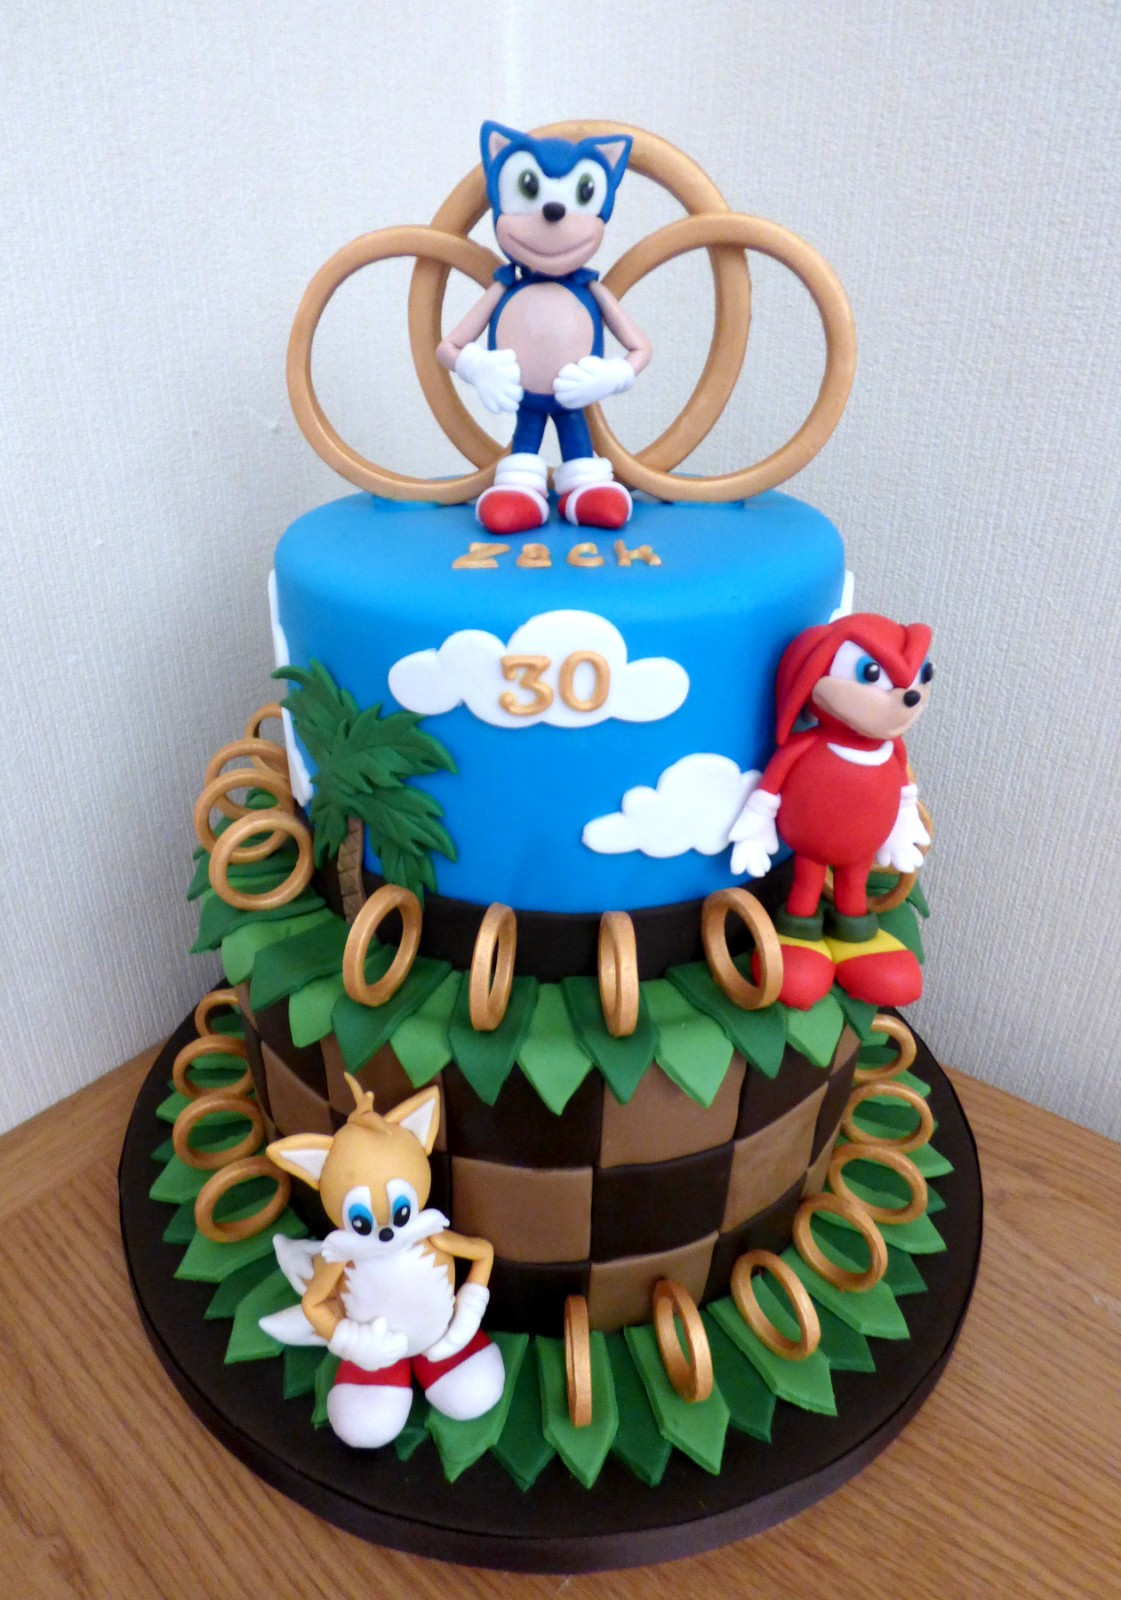 Superb 2 Tier Sonic The Hedgehog Birthday Cake Susies Cakes Funny Birthday Cards Online Elaedamsfinfo